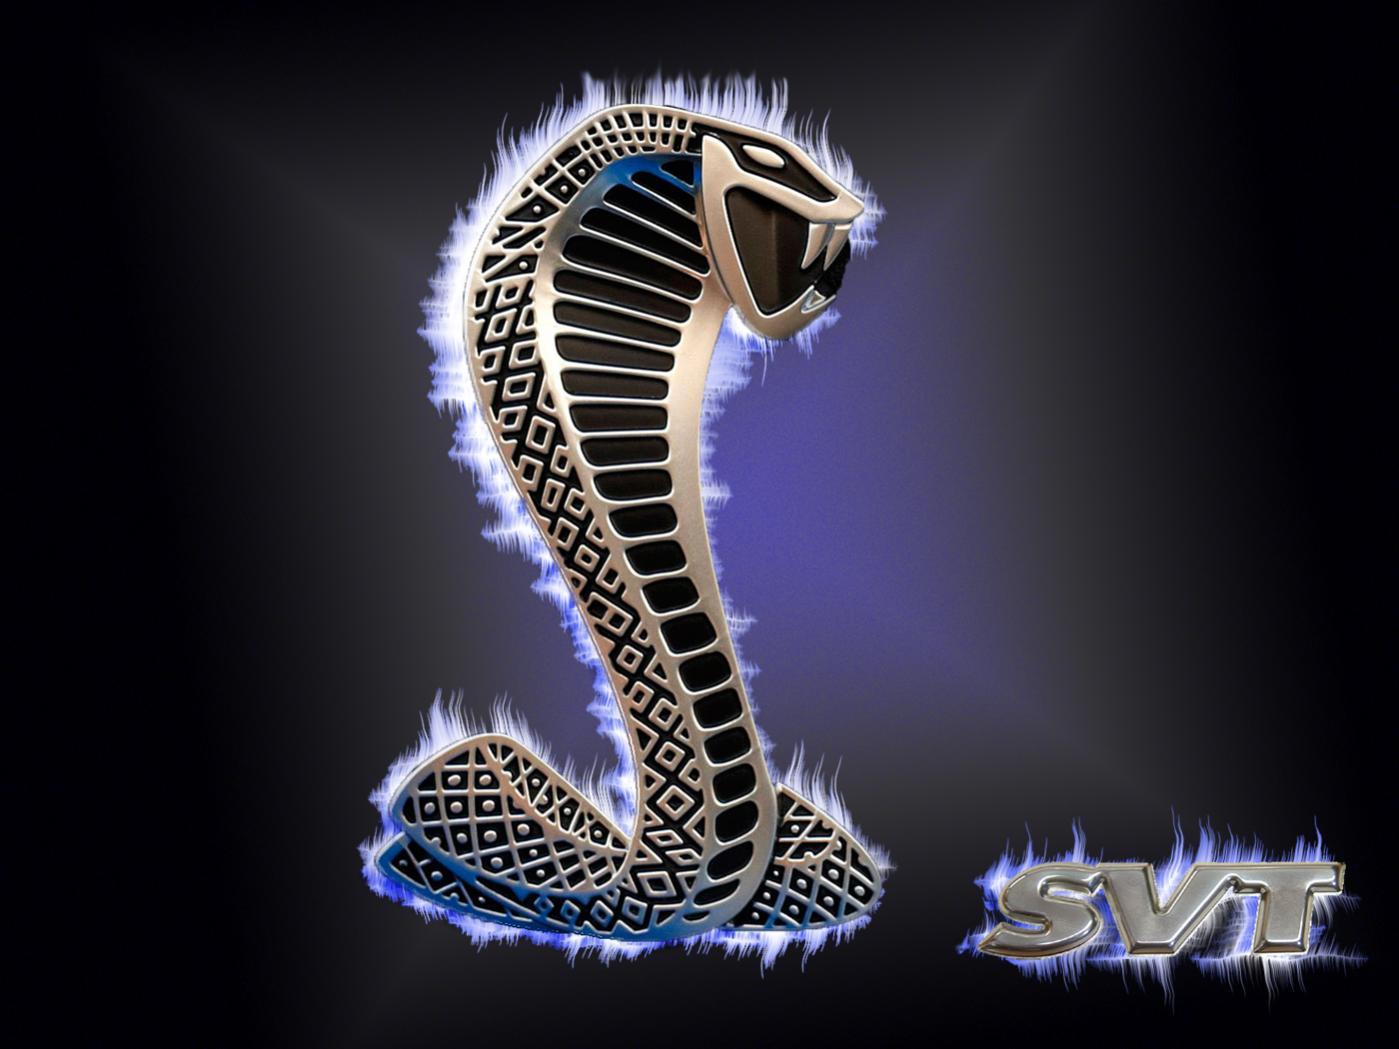 Mustang Cobra Logo Wallpaper 6 1399x1049